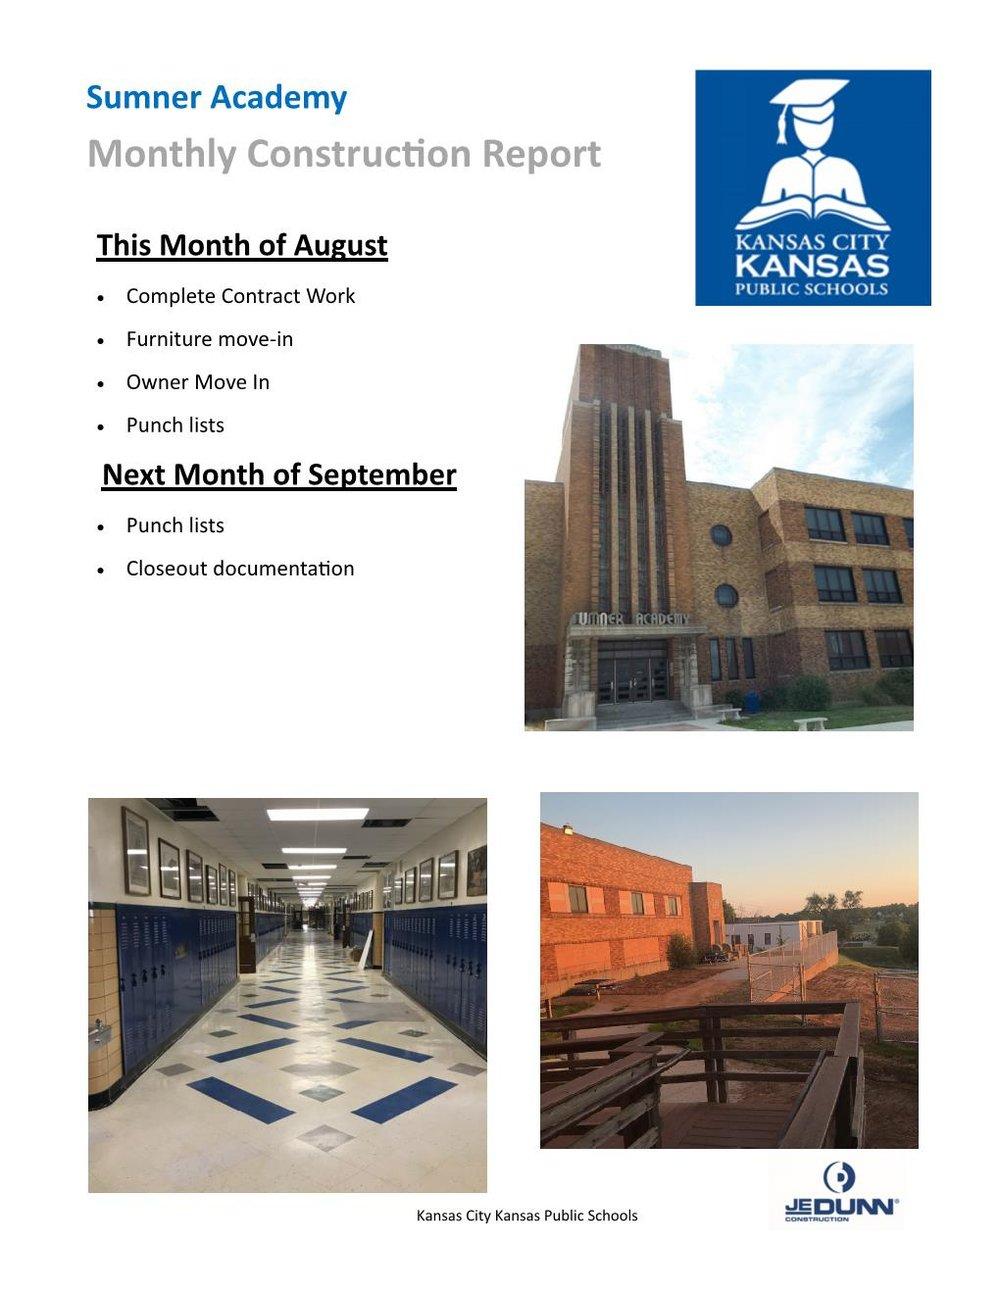 2018.08.27 - WP-03B August Photo Report Sumner Academy.jpg